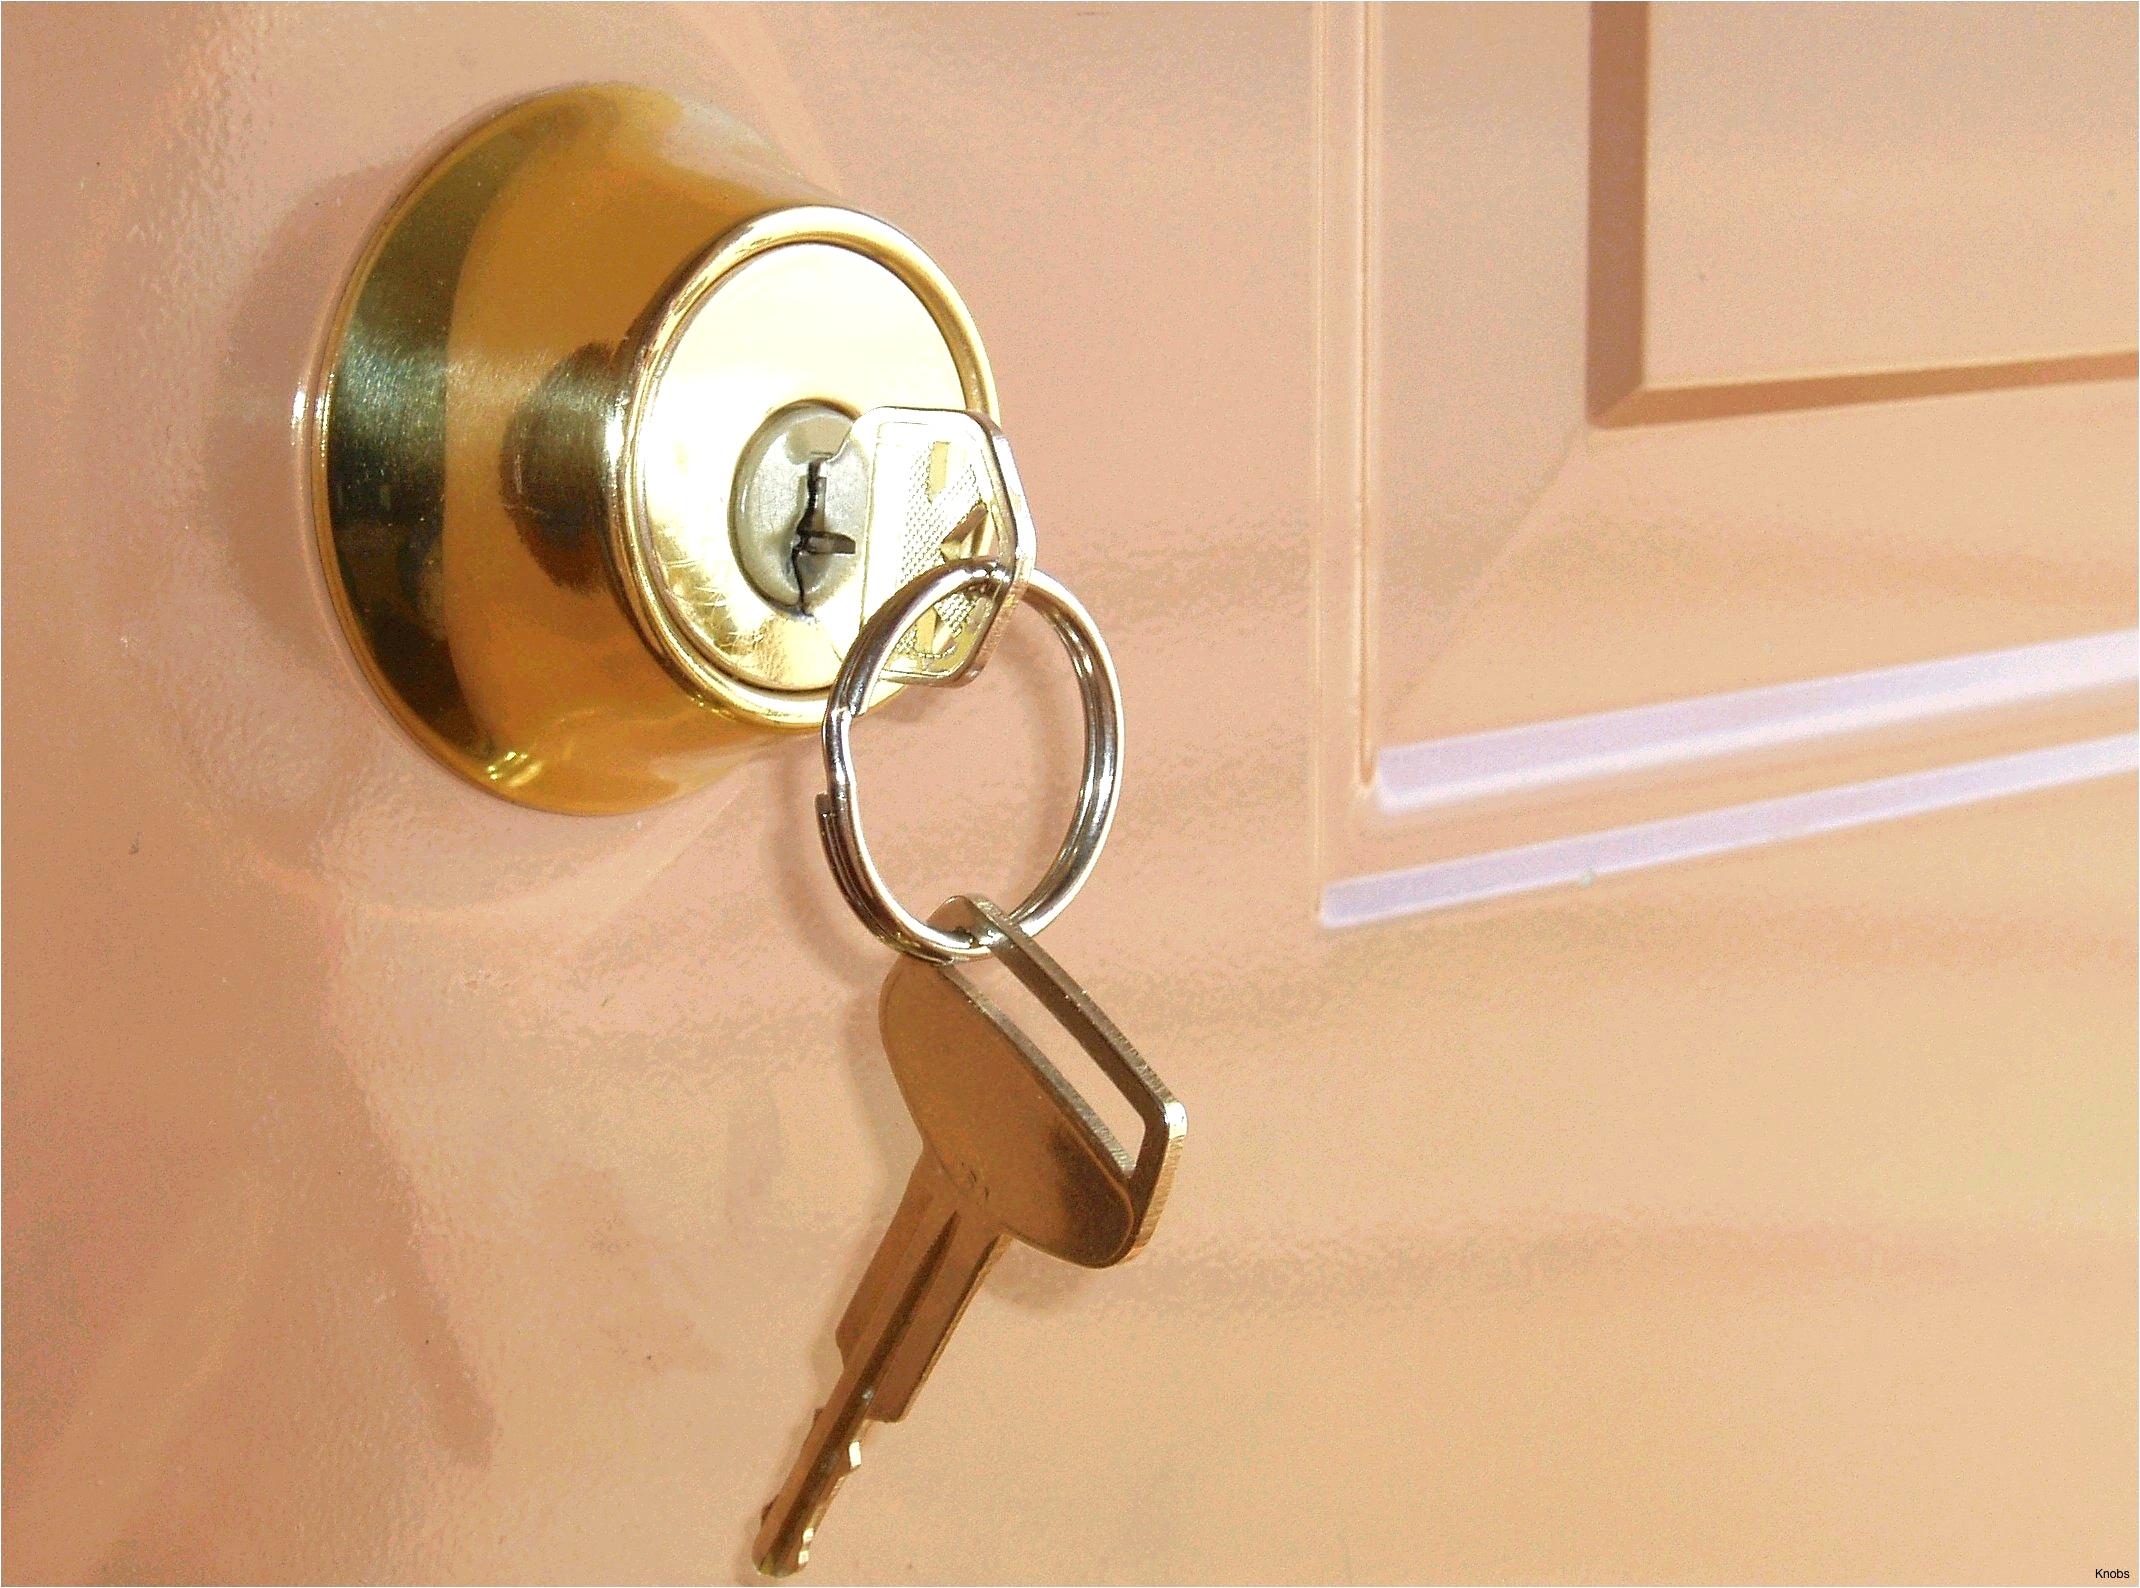 Lowes Interior Locking Door Knobs 50 New Lowes Interior Door Knobs Graphics 50 Photos Home Improvement